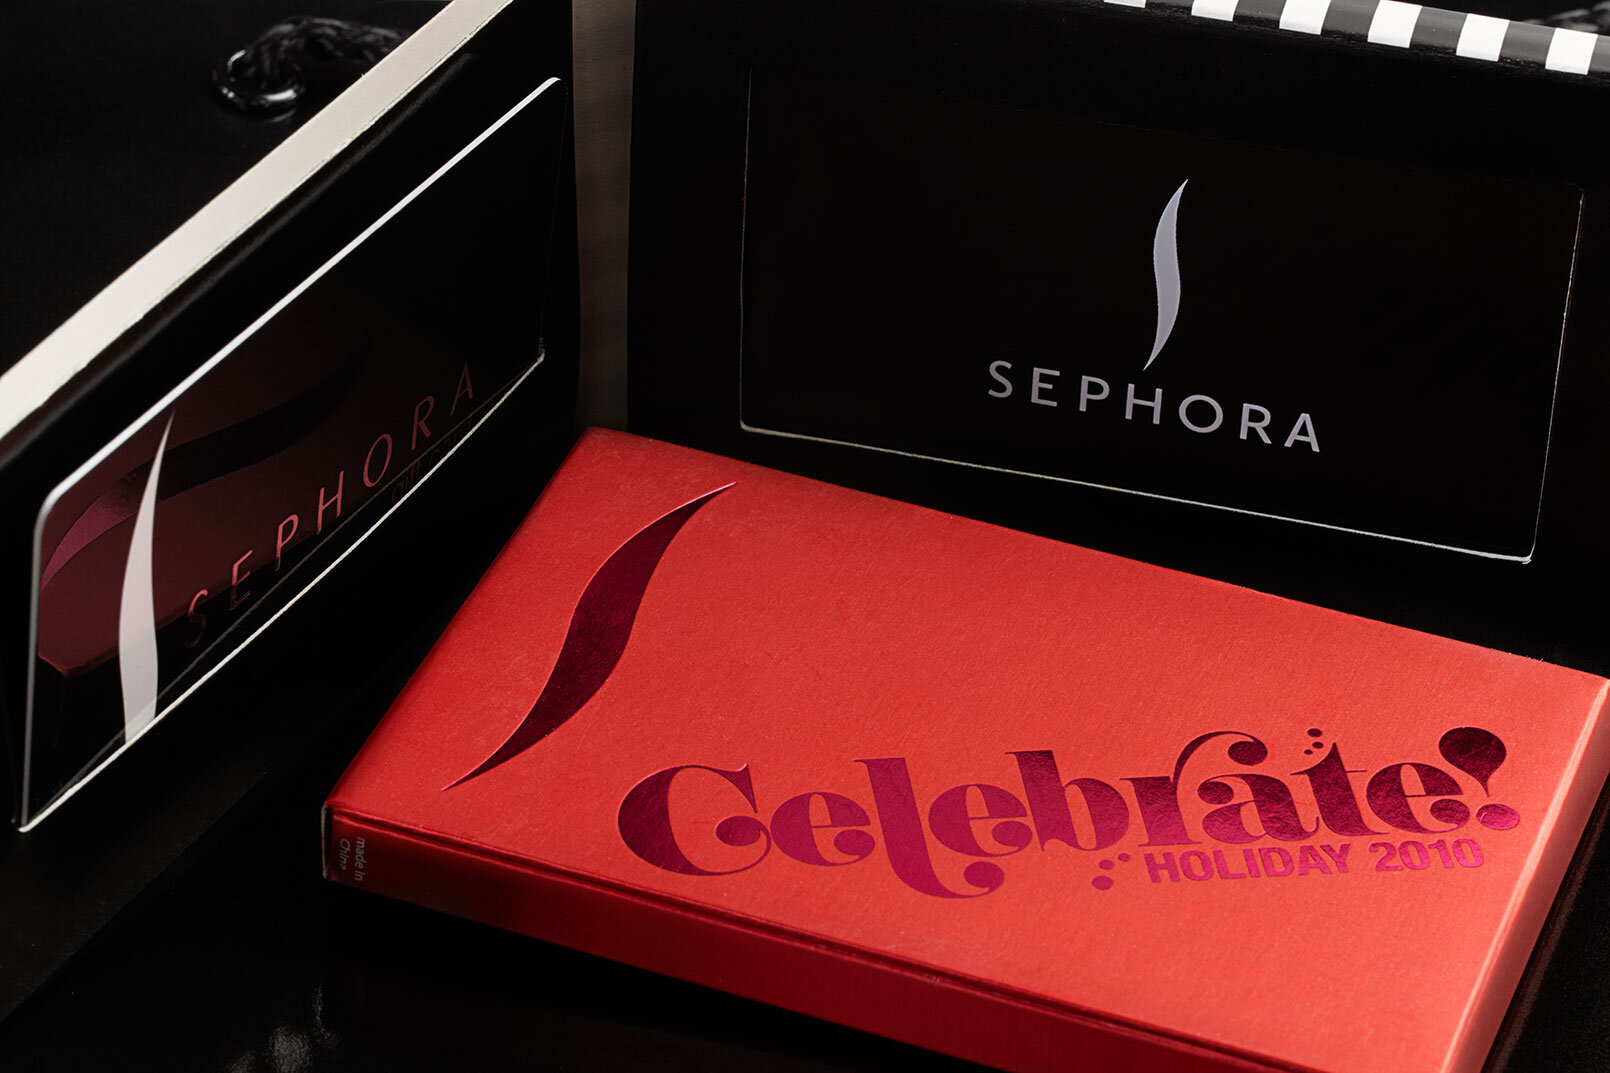 Sephora-Box-Packaging-Design-Company-6.JPG